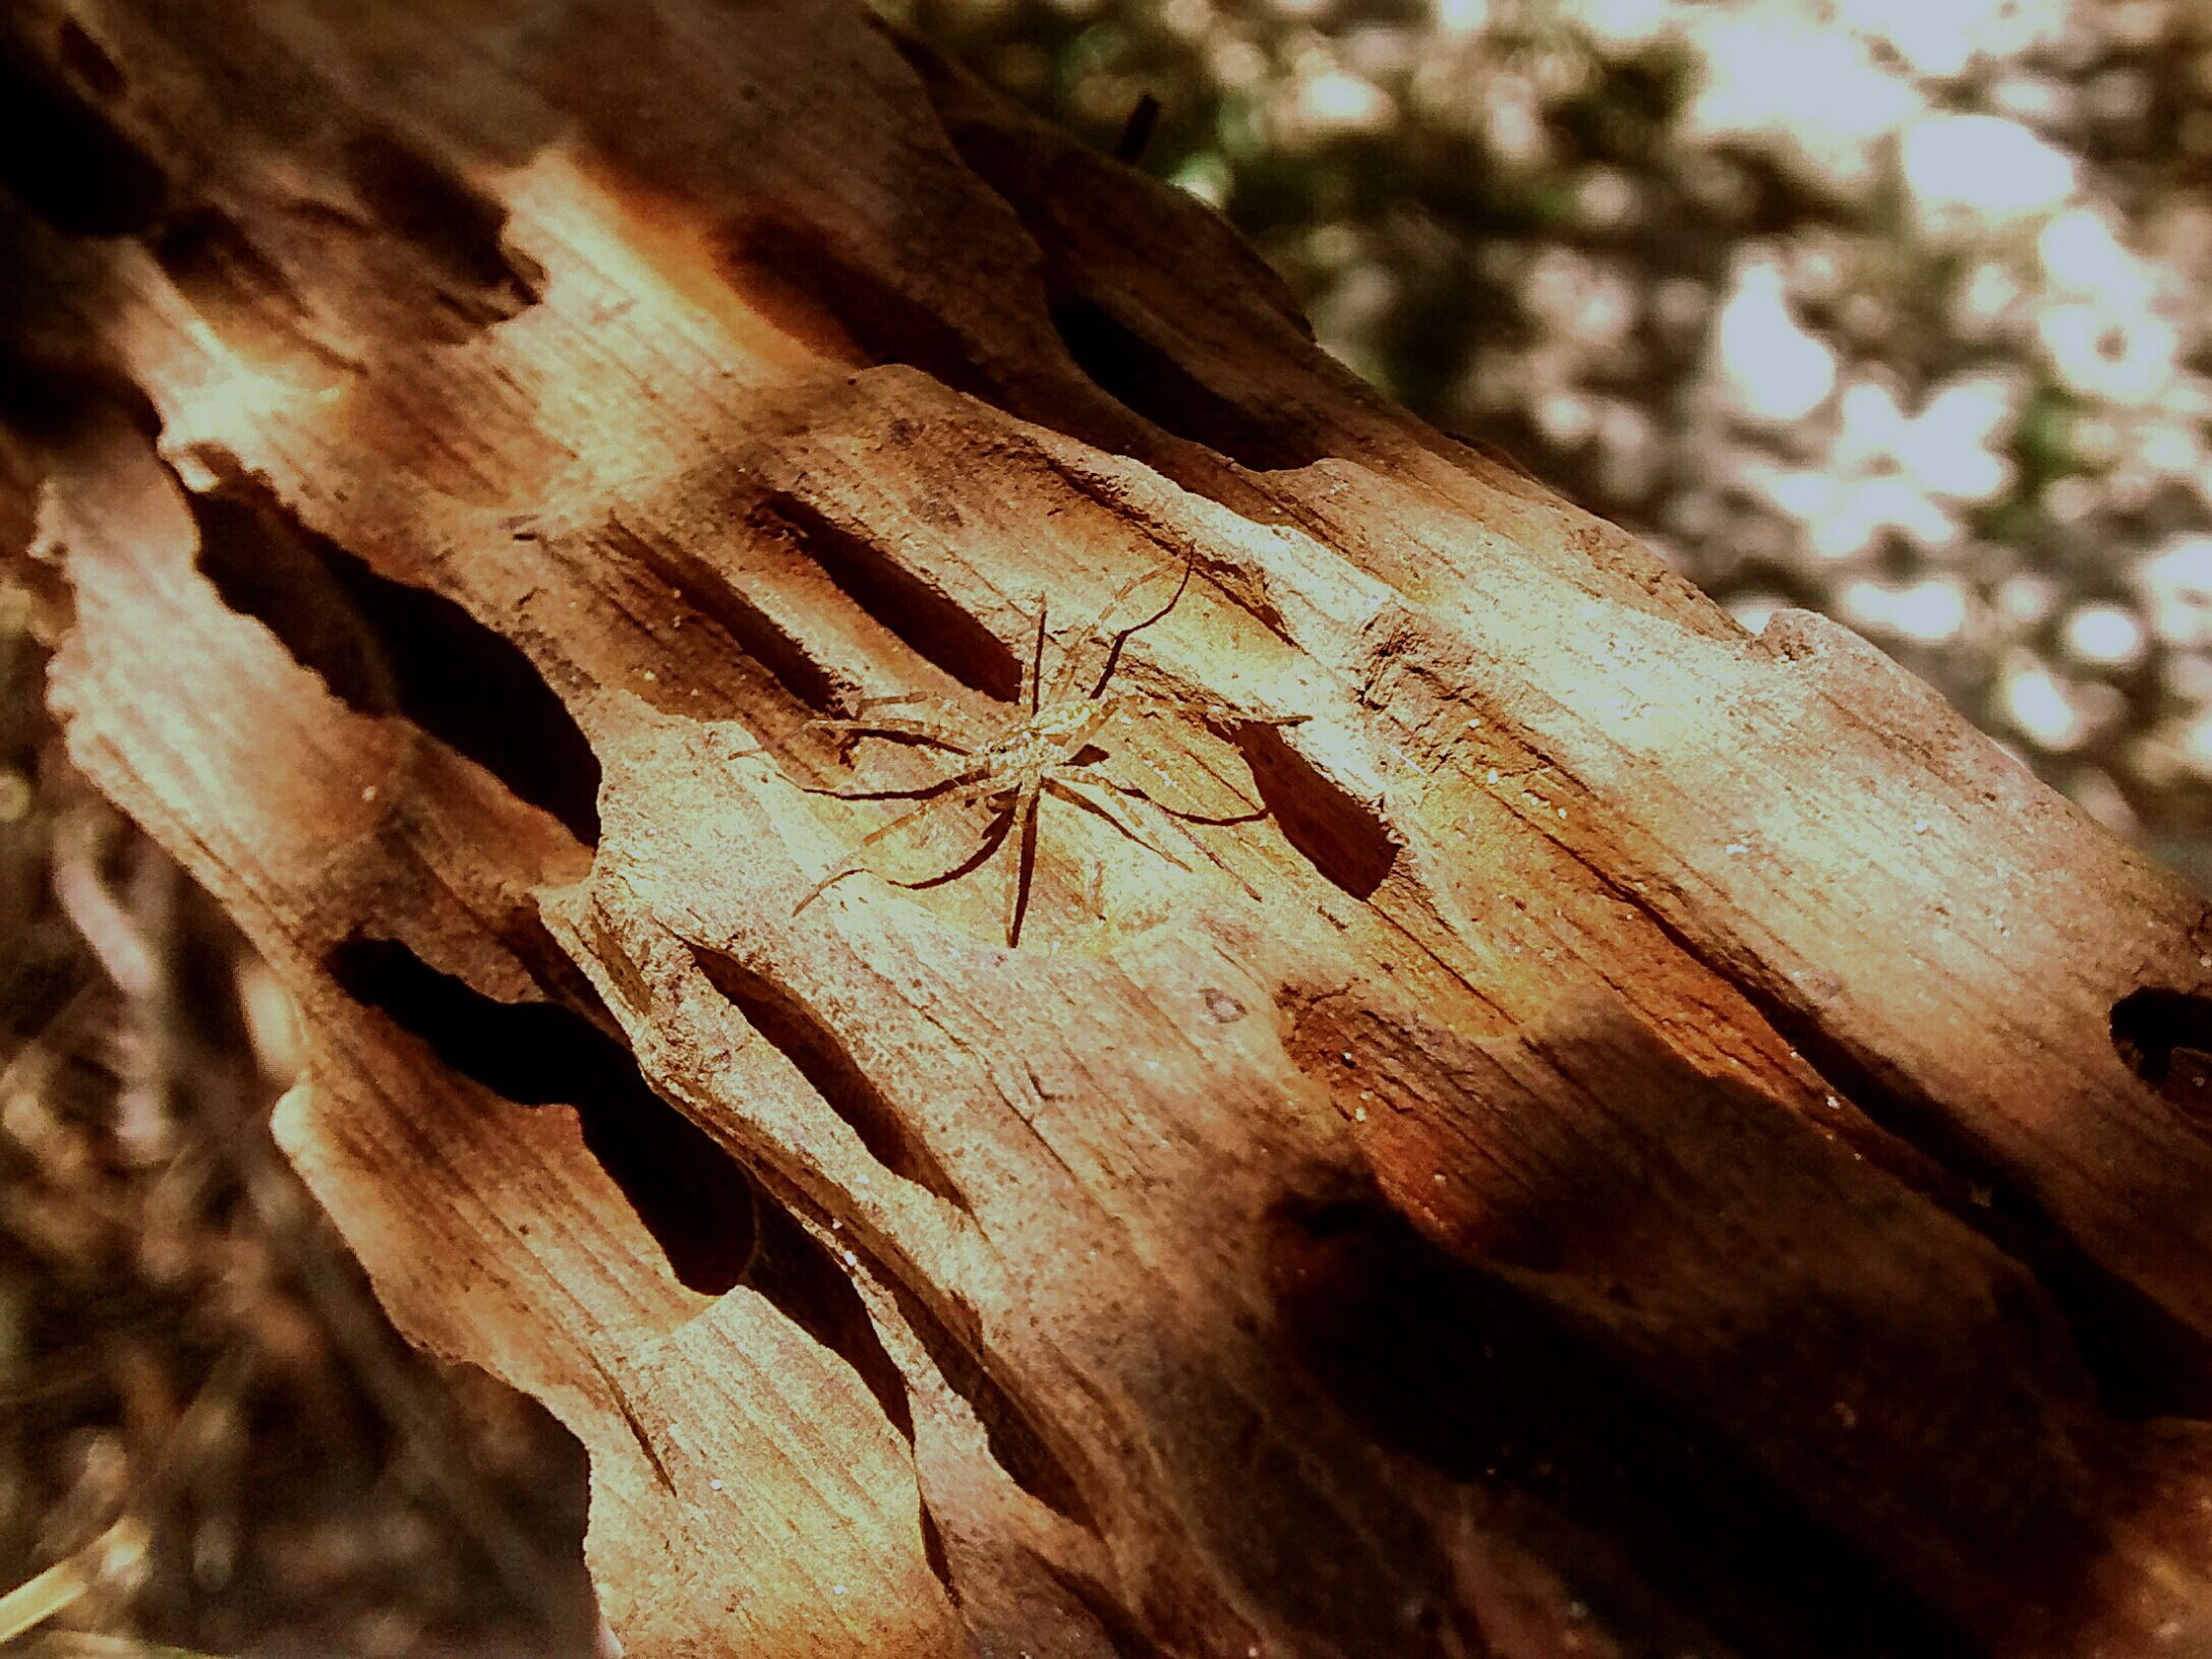 Spider Aranha Tripofobia Tripophobia Trypophobia Trypophilia